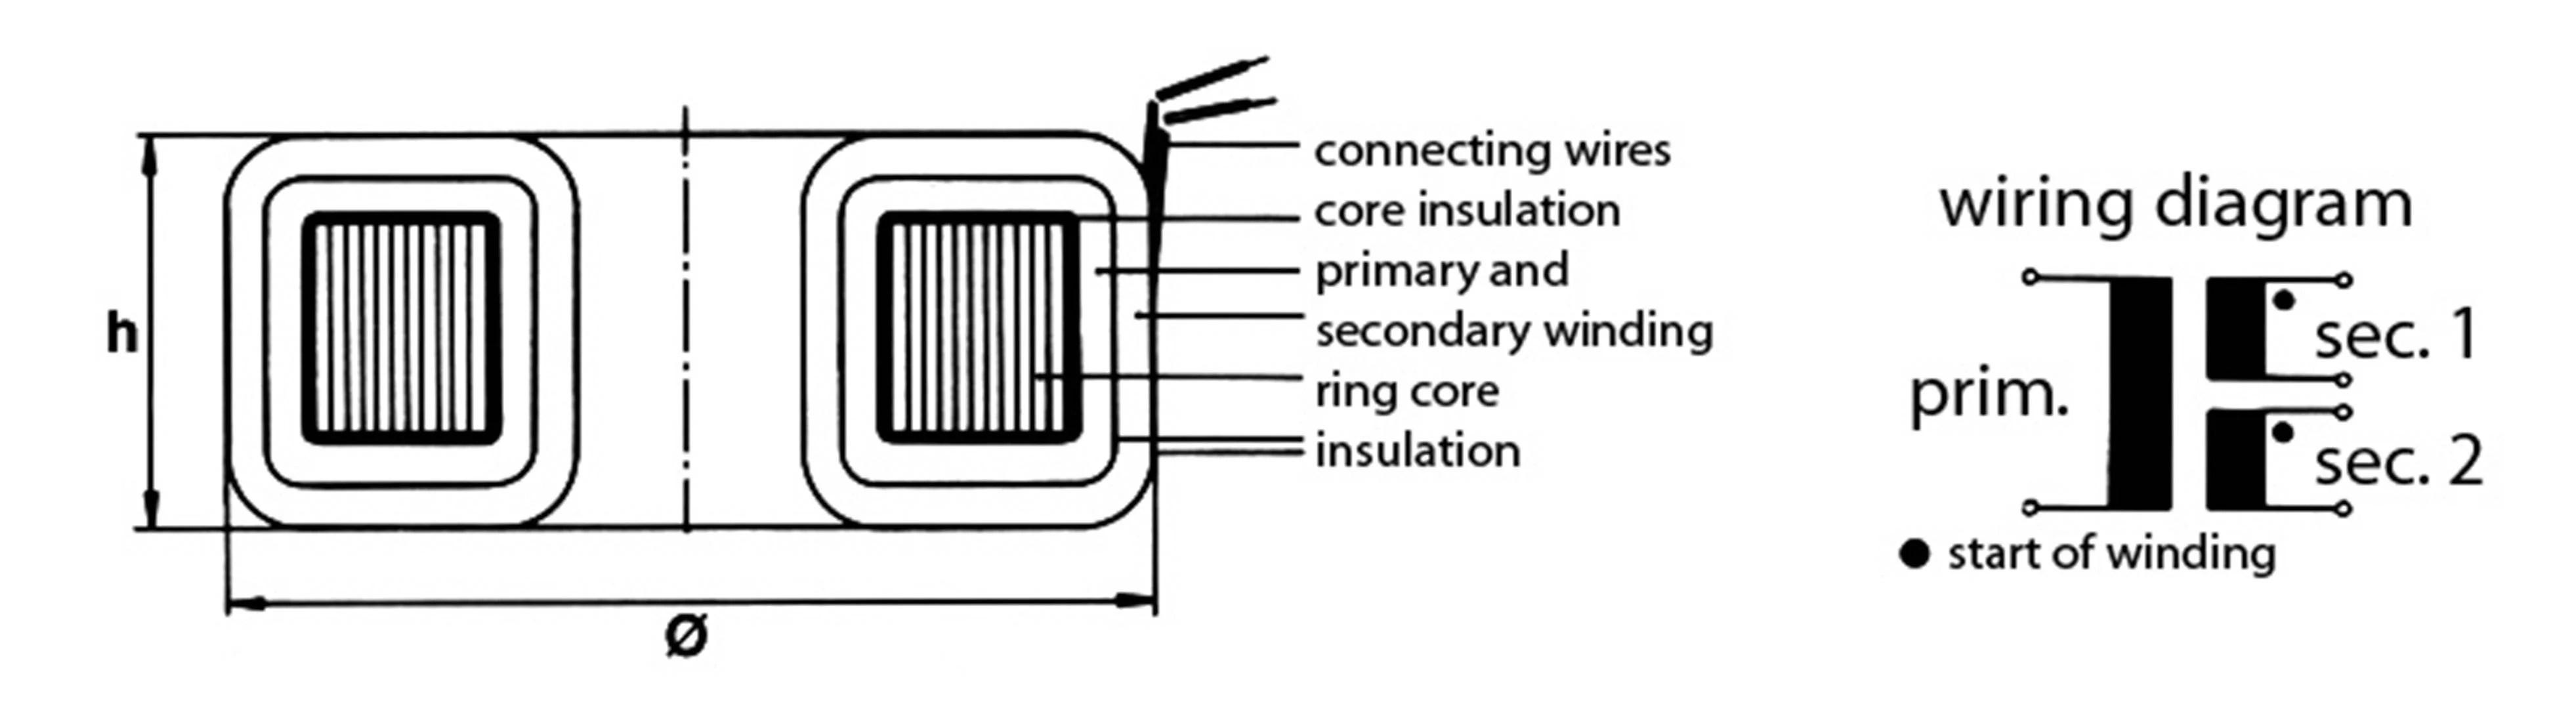 medium resolution of 2x15 wiring diagram wiring diagram paper cd15 new racing cdi wiring diagram